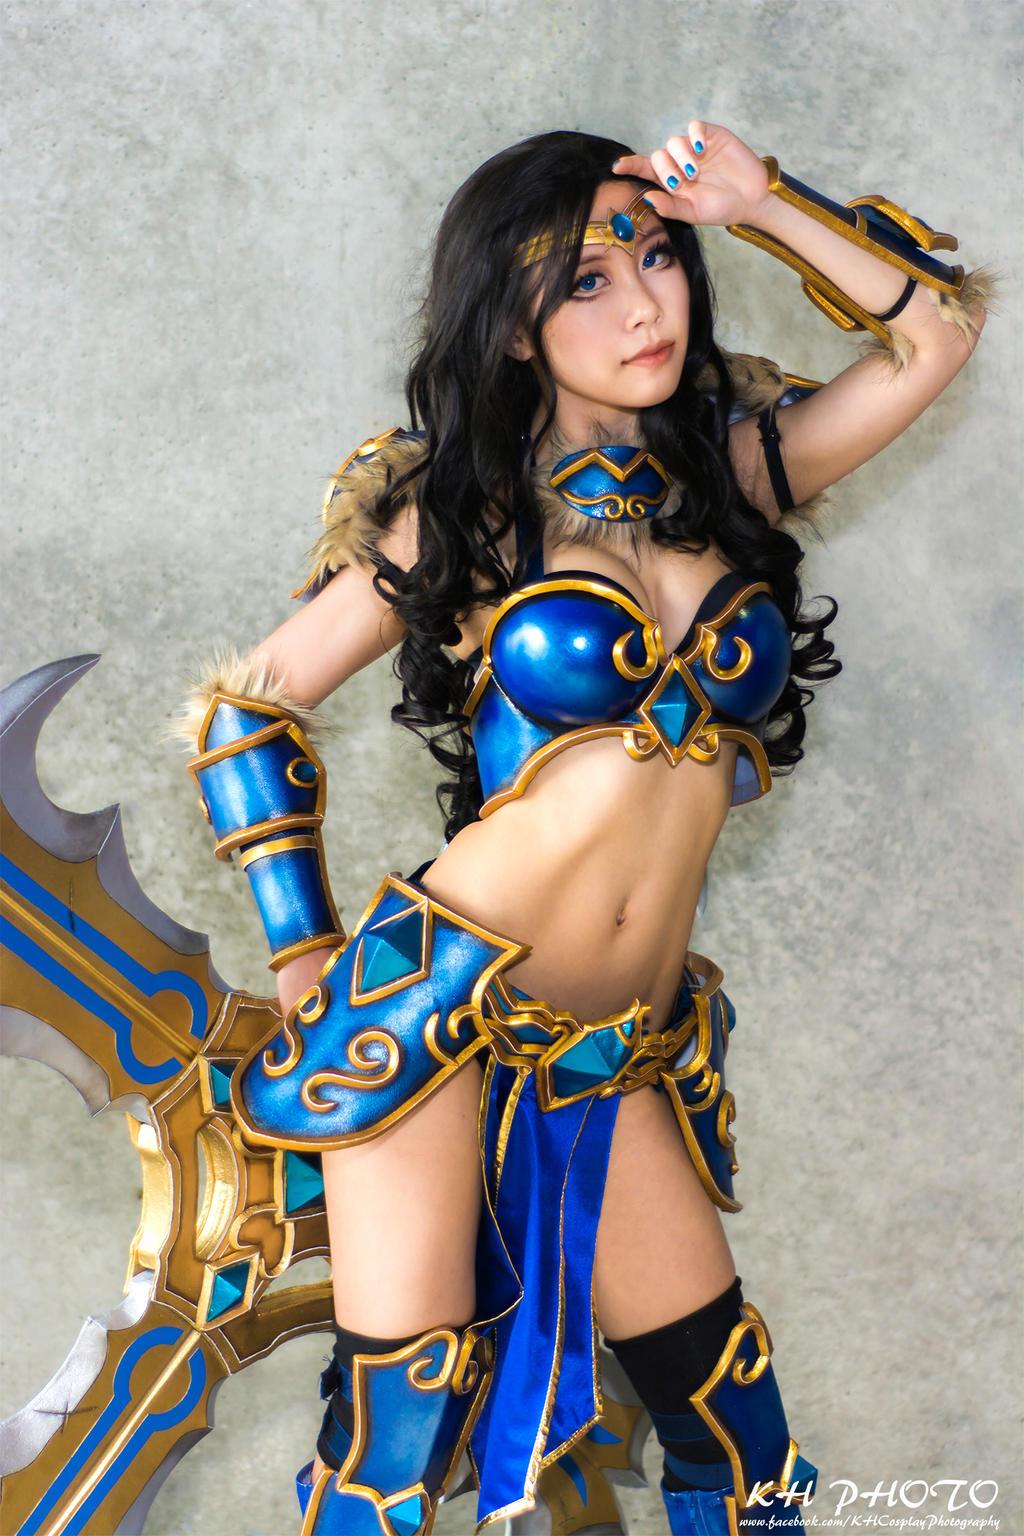 Nude league of legends cosplay